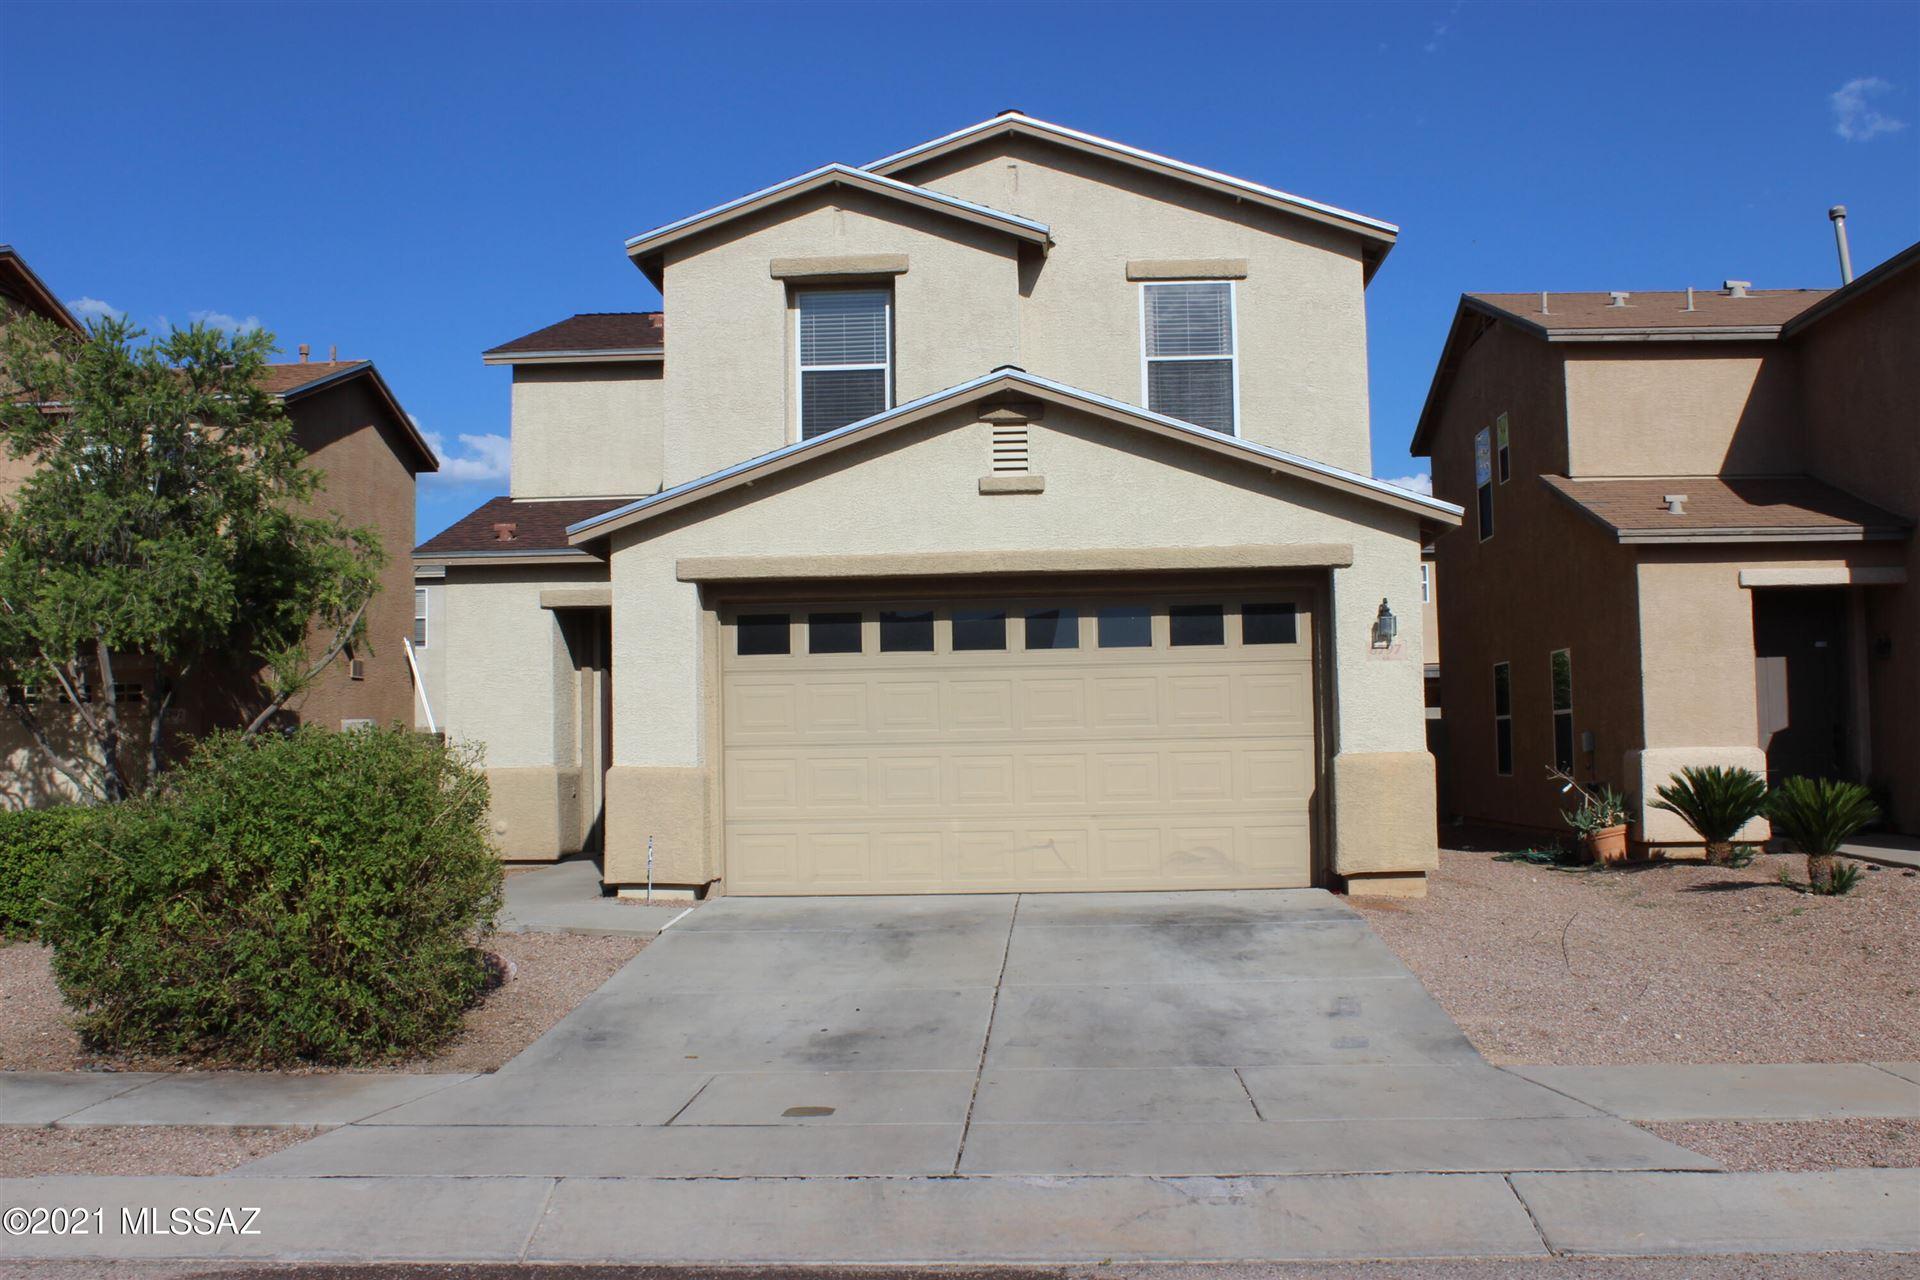 6797 S Parliament Drive, Tucson, AZ 85756 - MLS#: 22123418